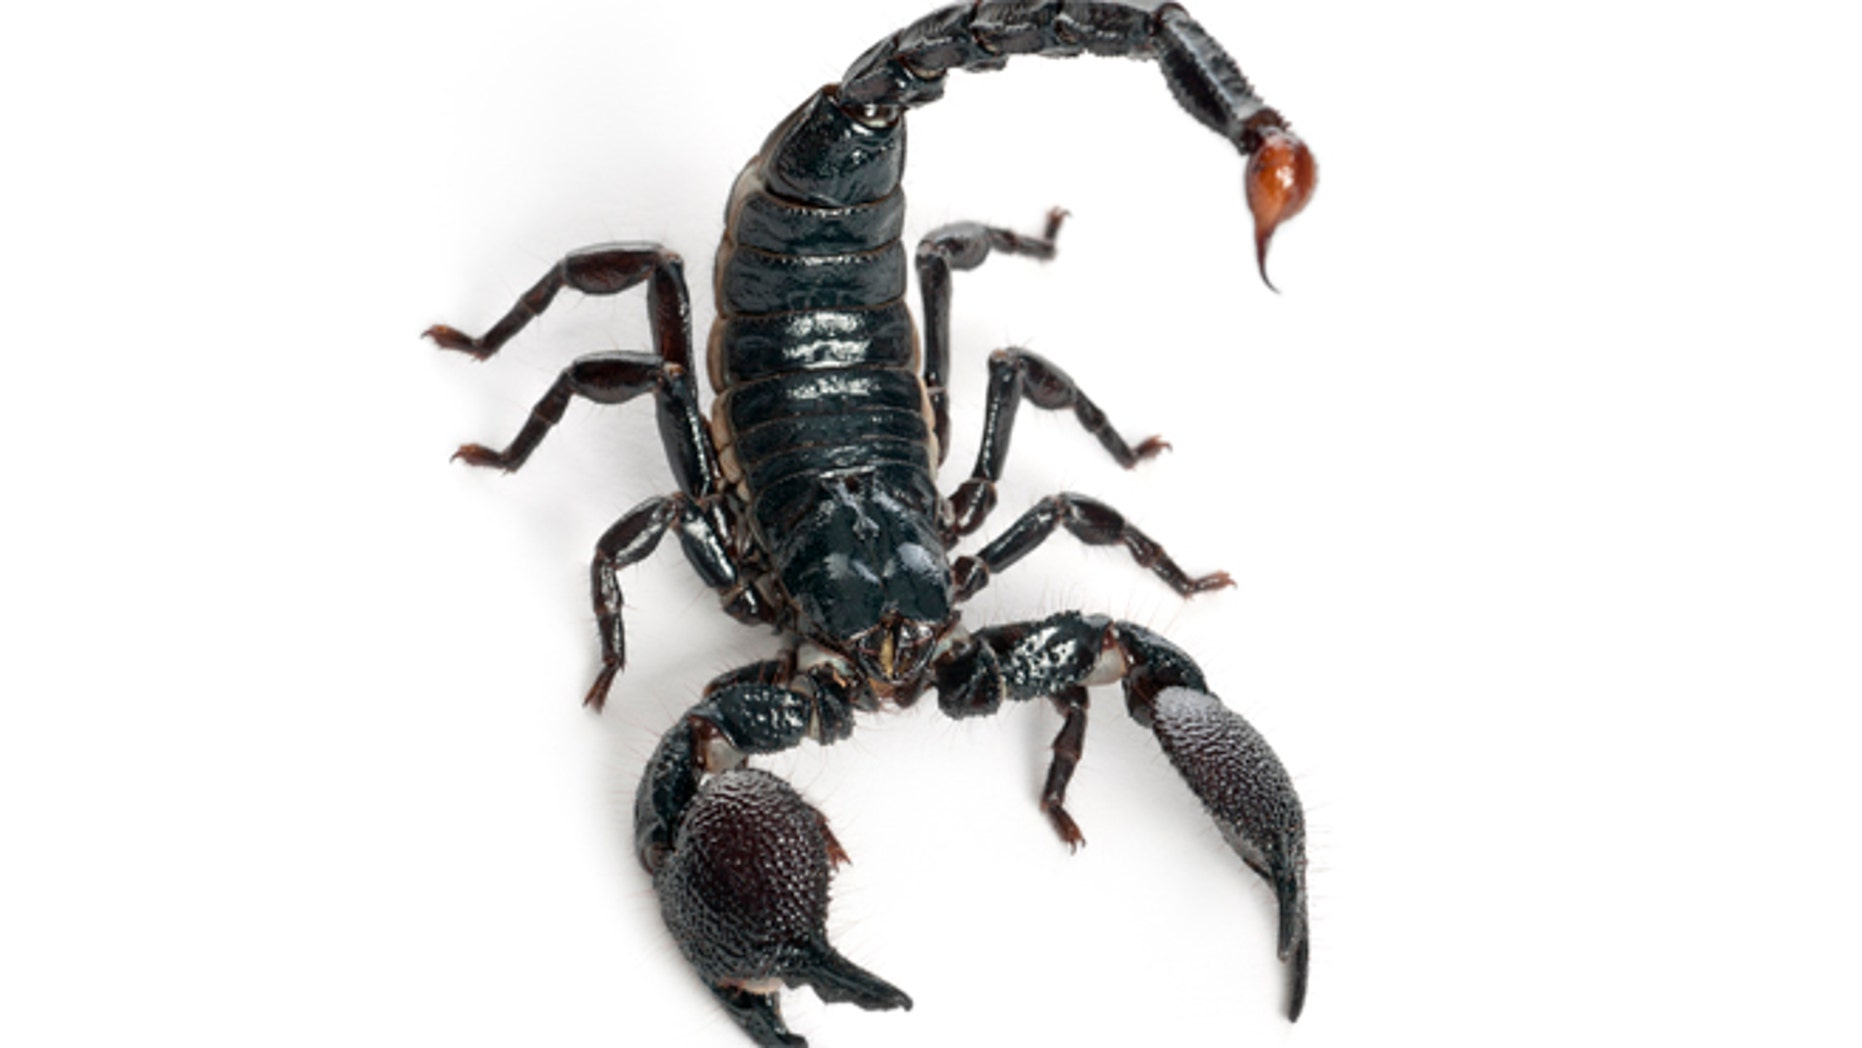 emperor scorpion - Pandinus imperator (1 year old)